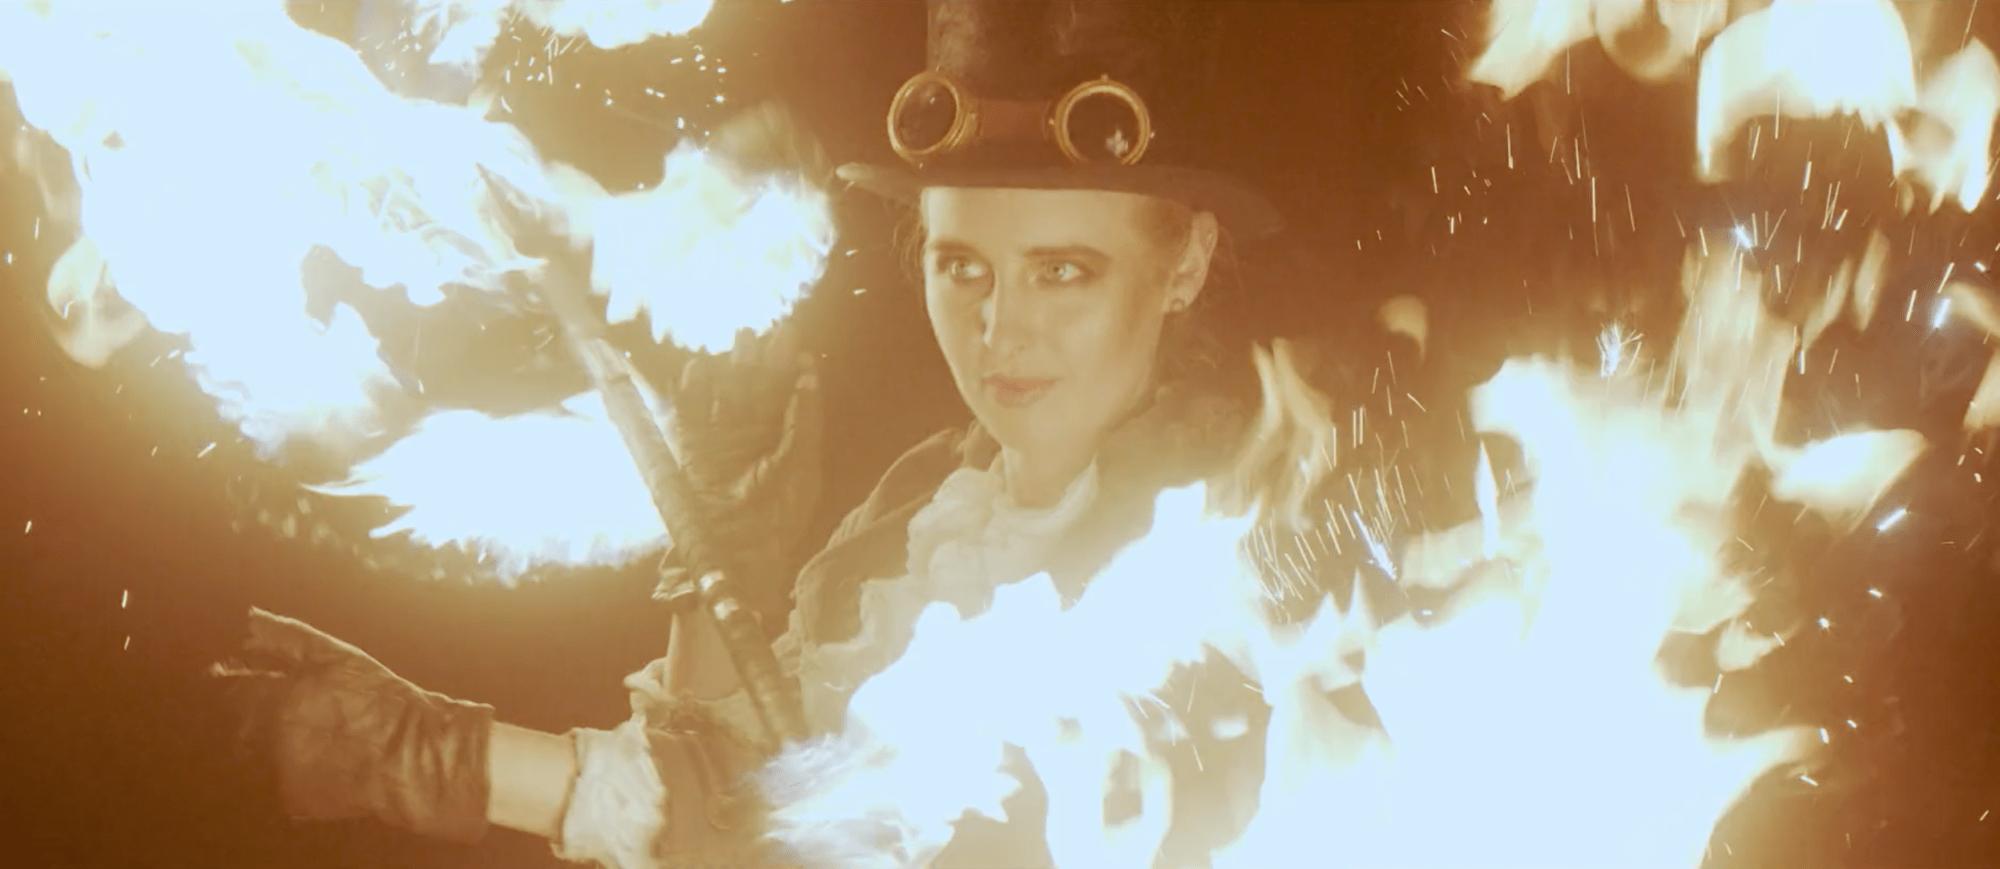 Elddansare i steampunk kläder